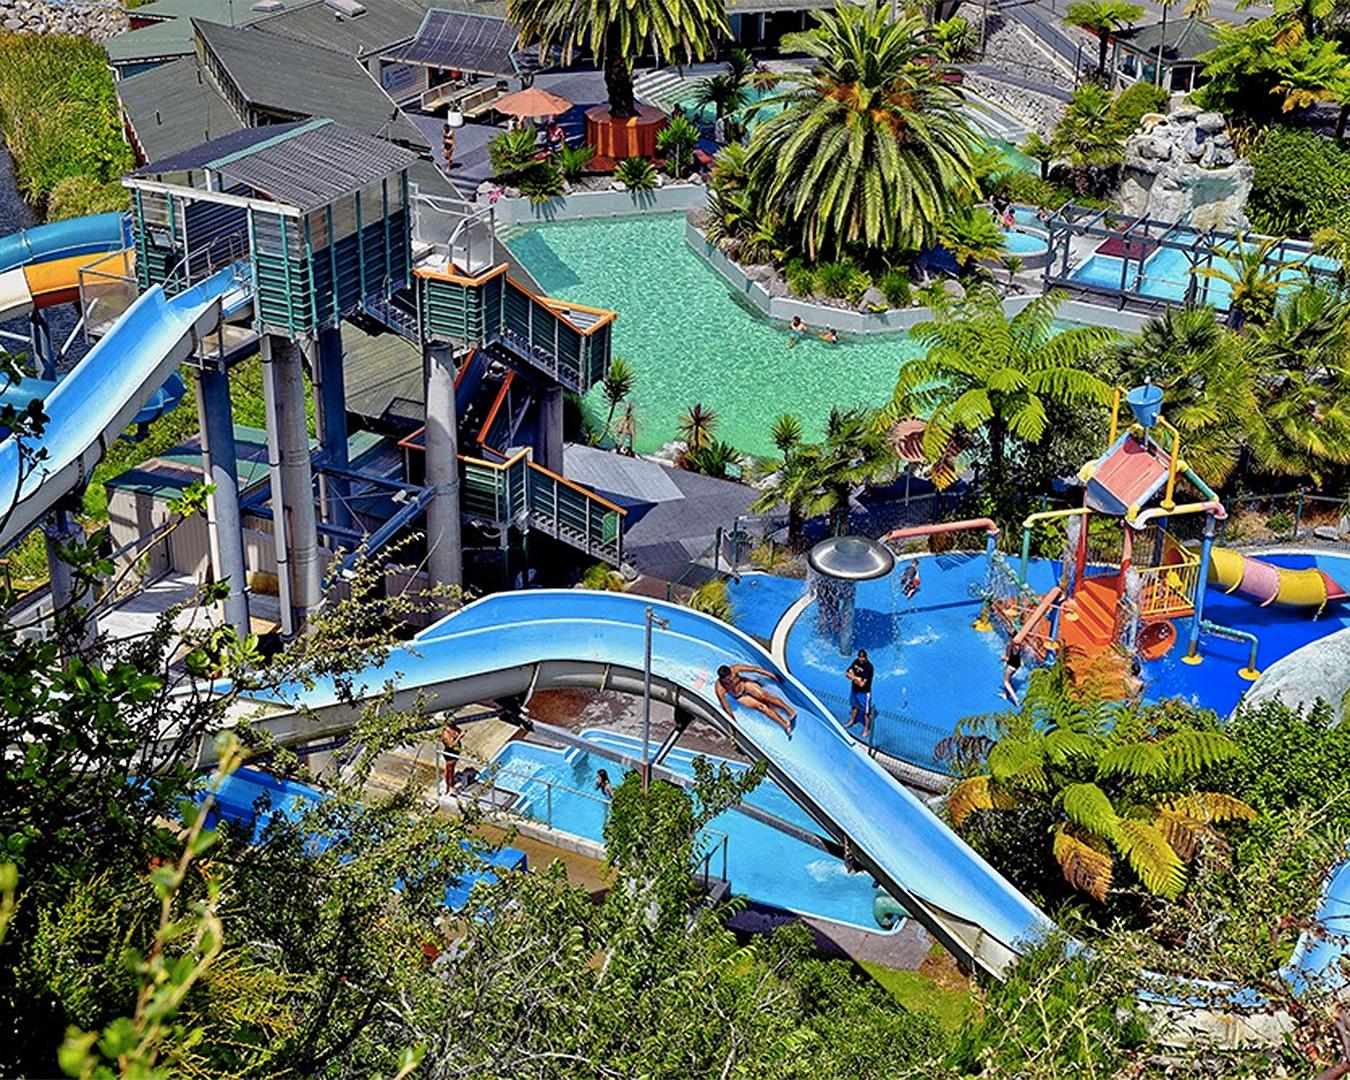 Water slides at Taupo DeBretts.